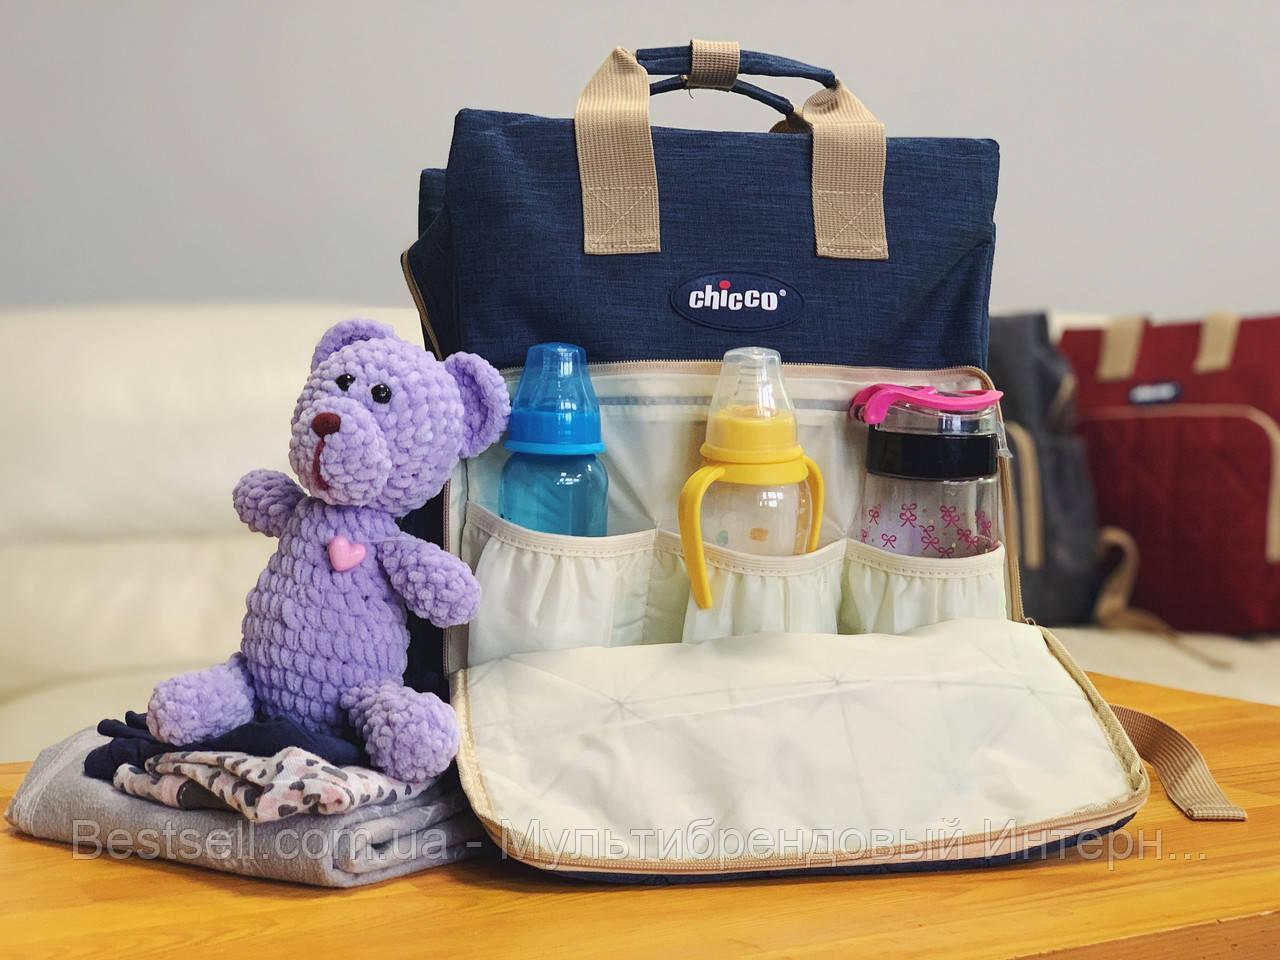 Сумка - рюкзак для мам Chicco Чико  ⏩ синий цвет